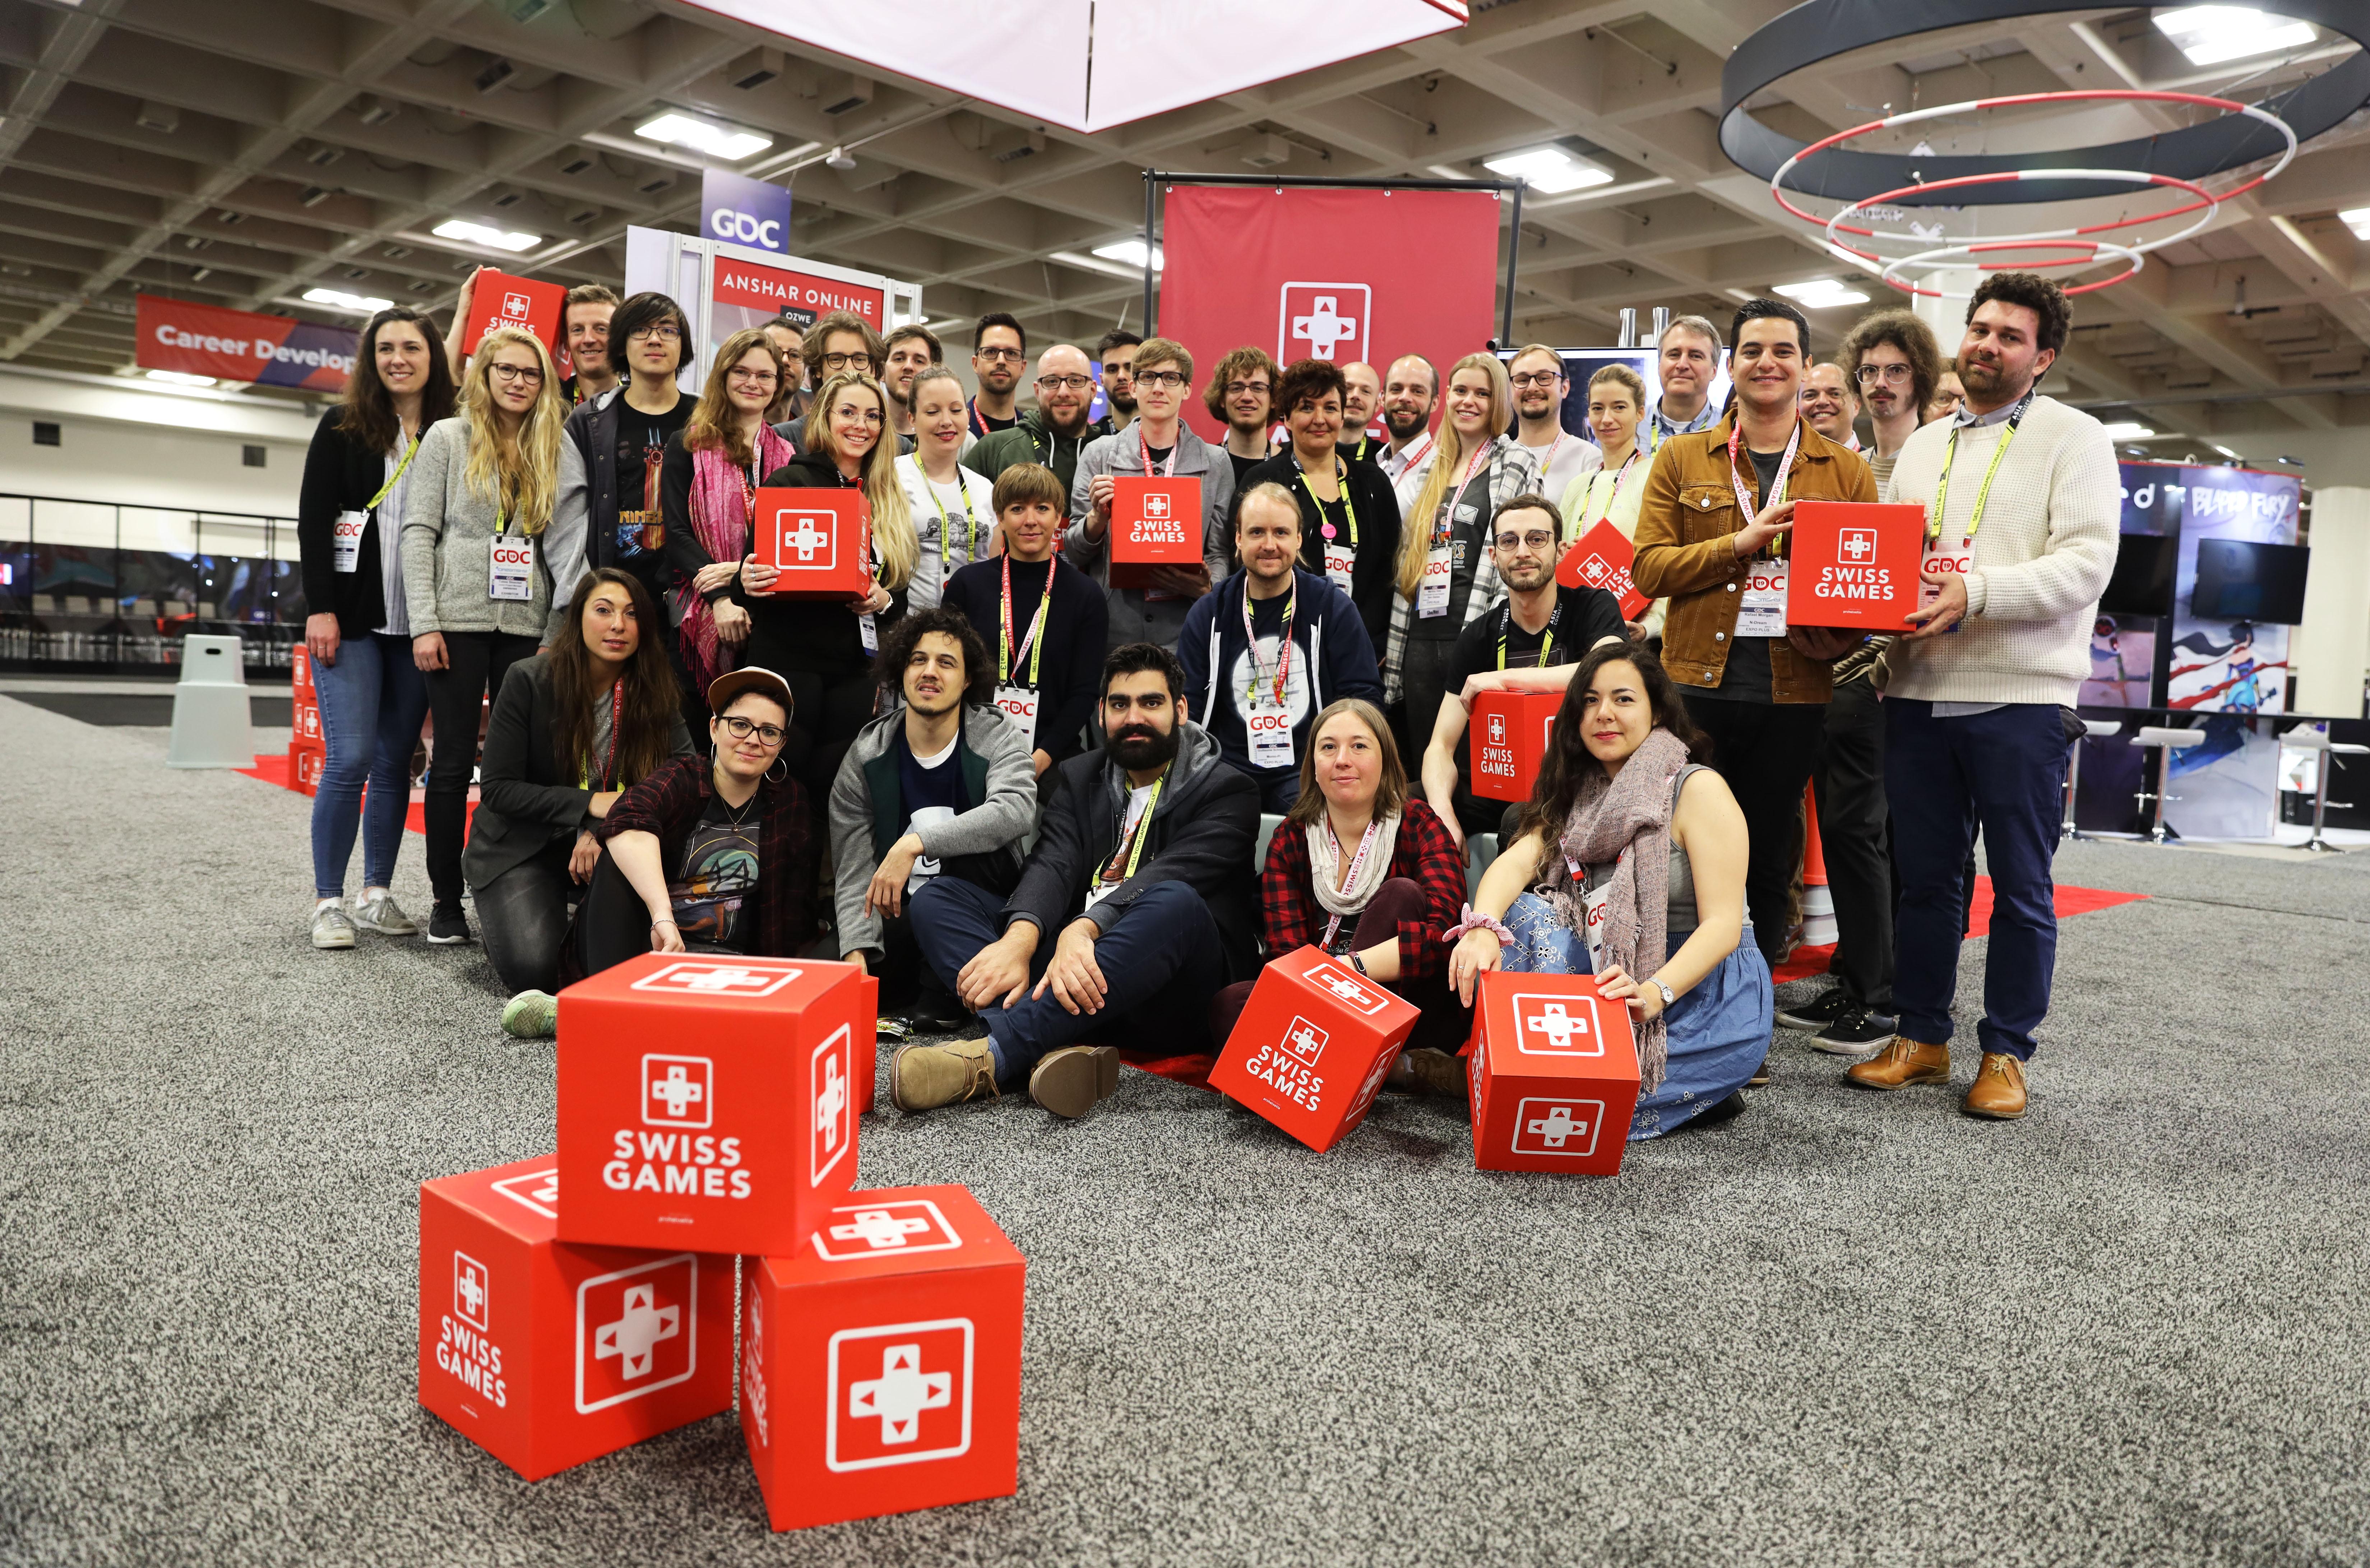 A look back at the GDC 2019 SwissGames delegation - SWISSGAMES